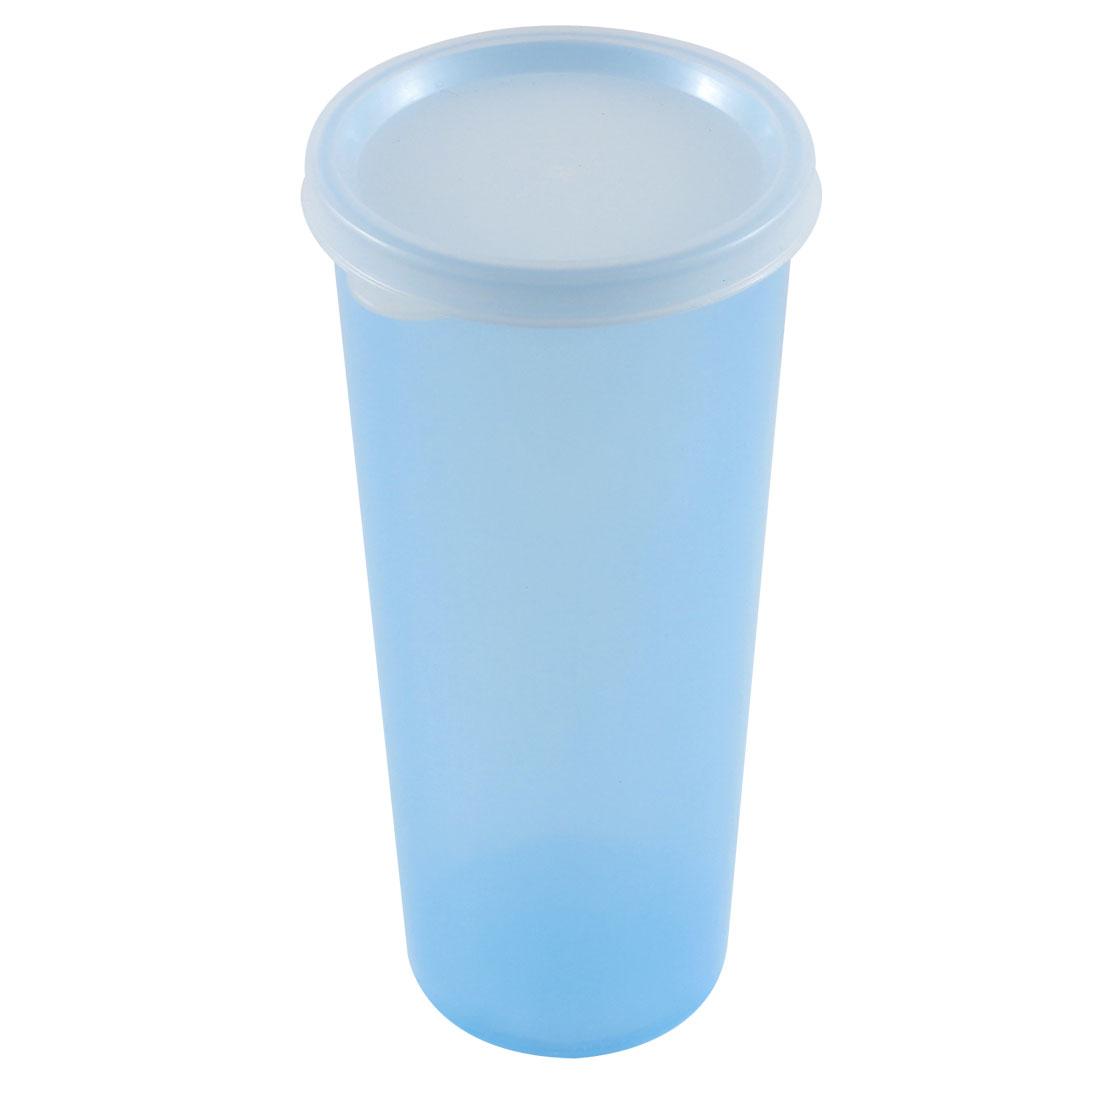 Plastic 500mL Capacity Portable Casual Sport Fruit Juice Water Cup Bottle Blue